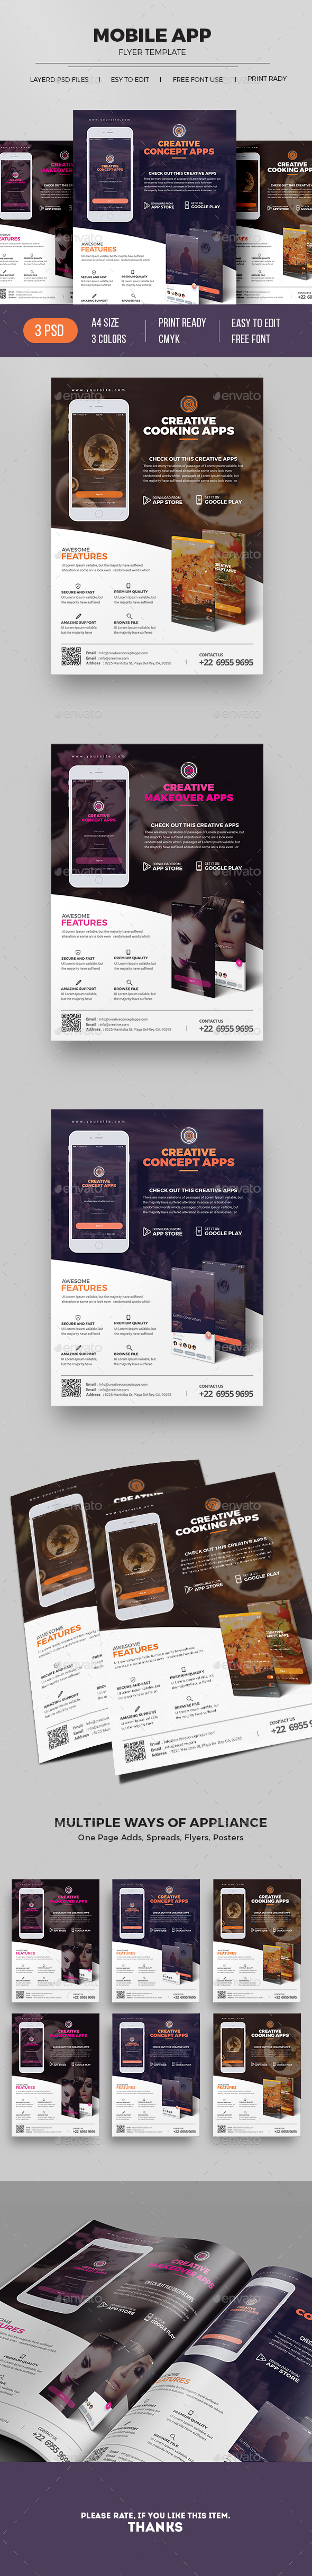 Mobile App Flyer - Commerce Flyers